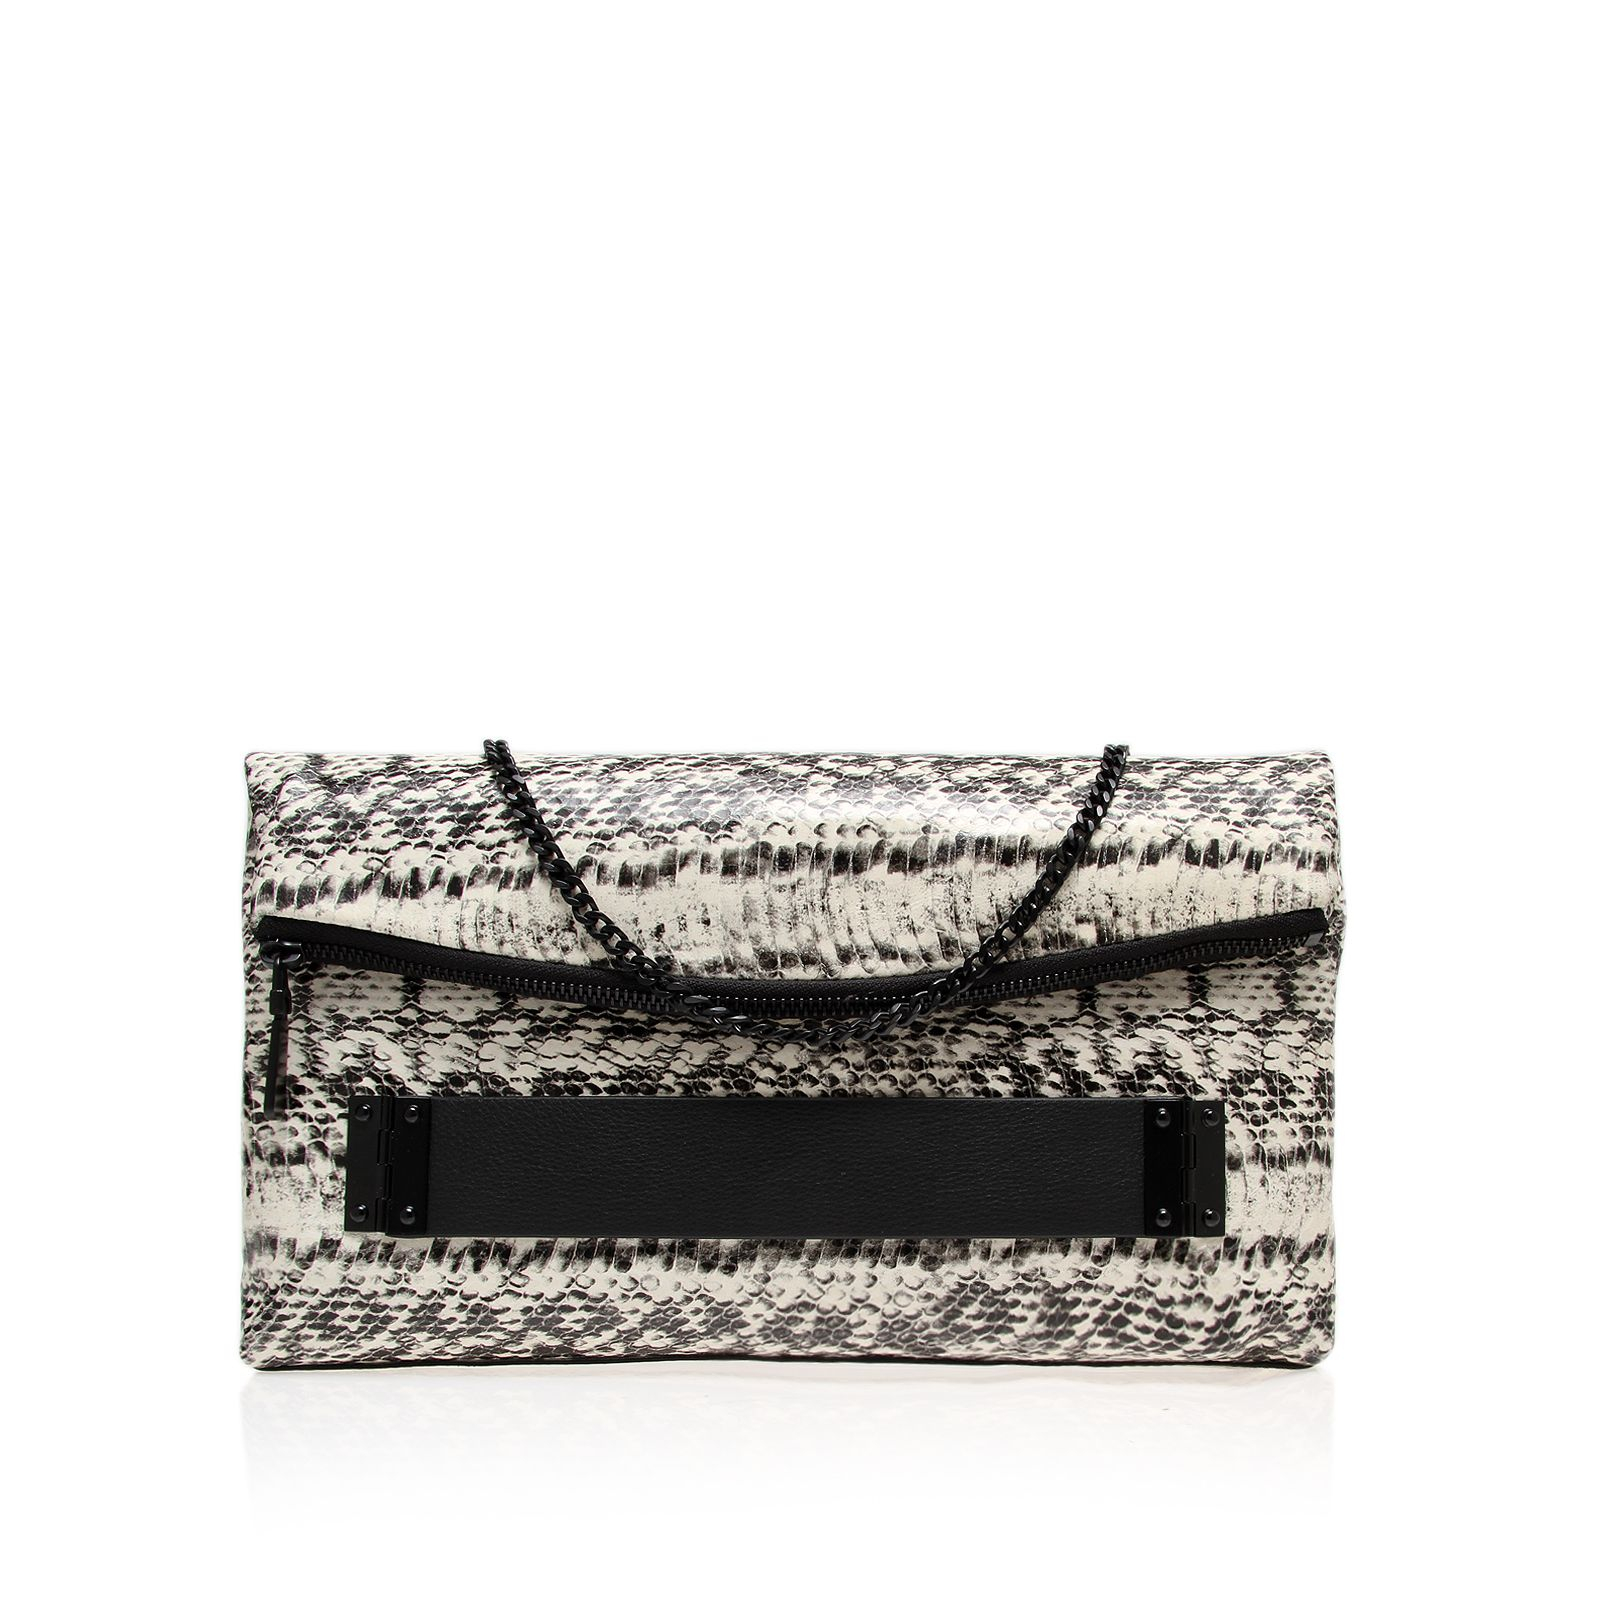 sale handbags at house of fraser